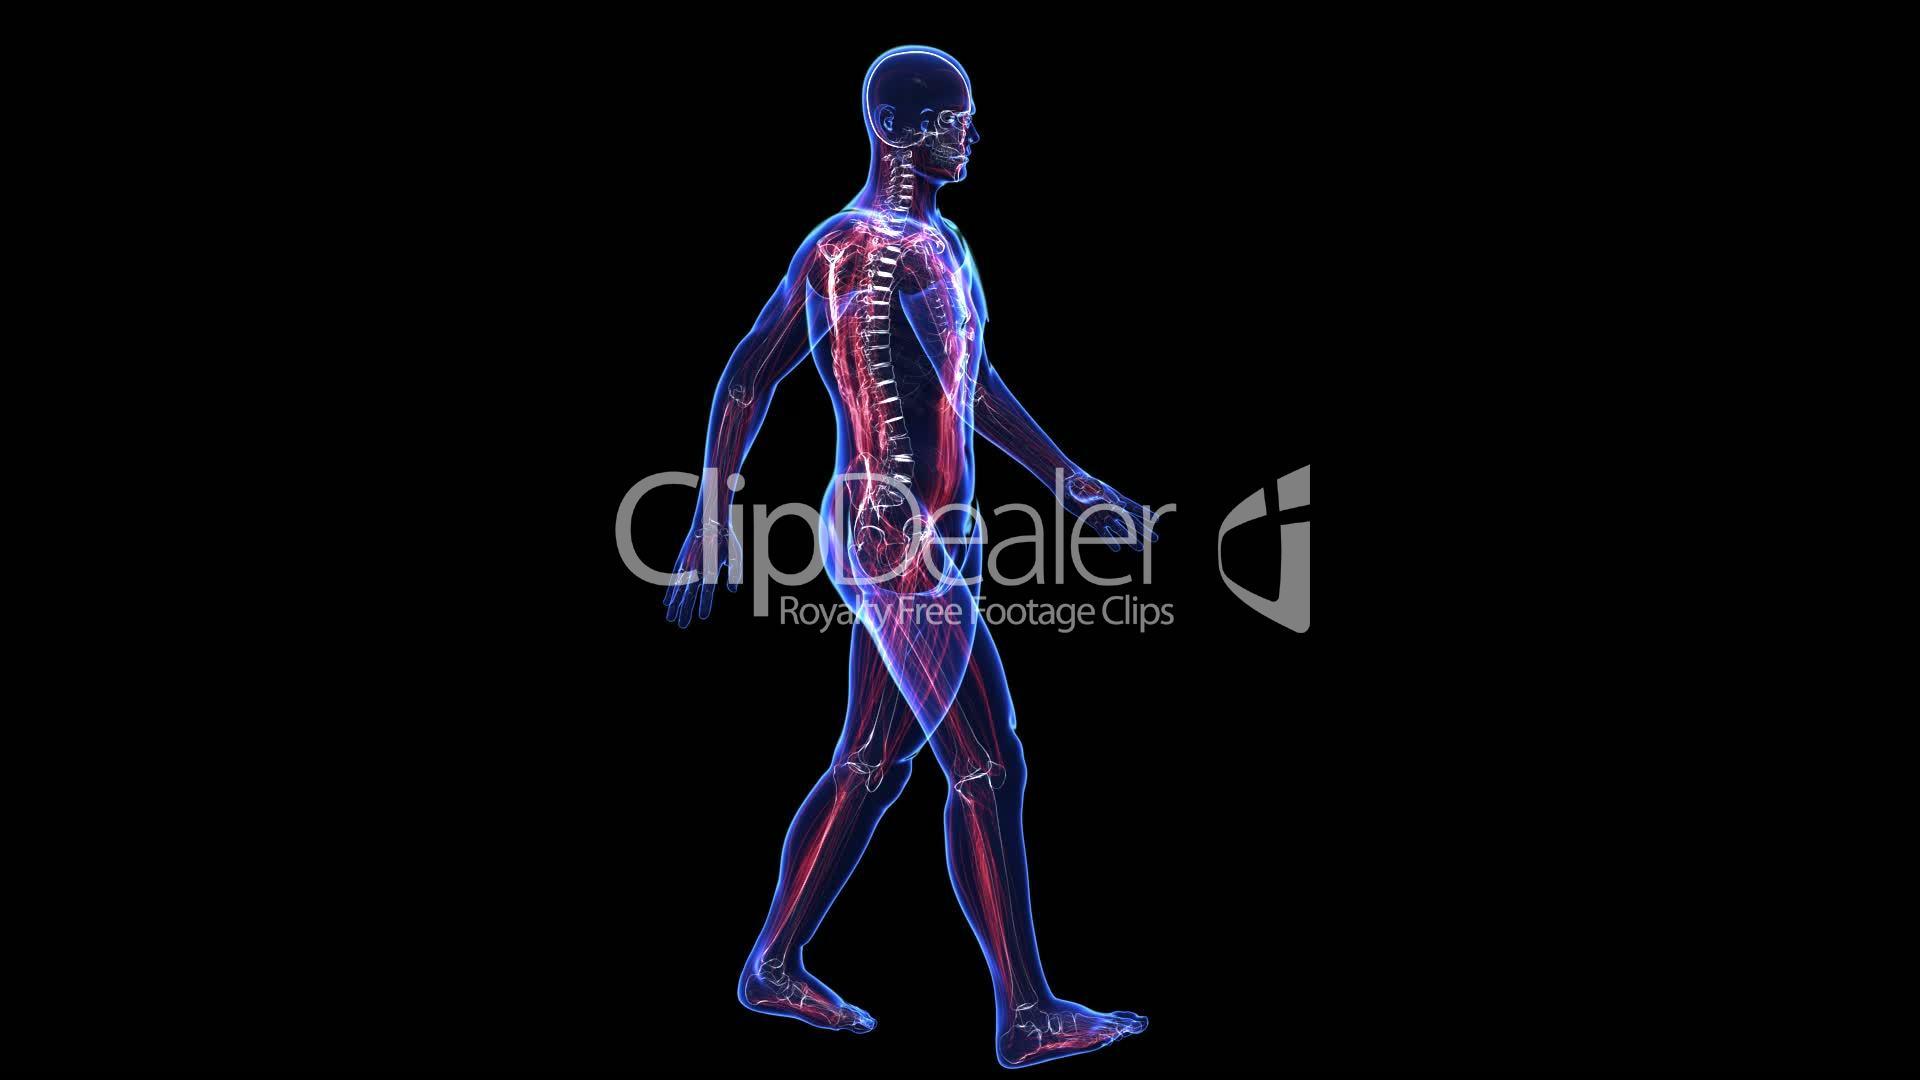 Anatomy Of The Human Body Skin Skeleton And Muscules Lizenzfreie